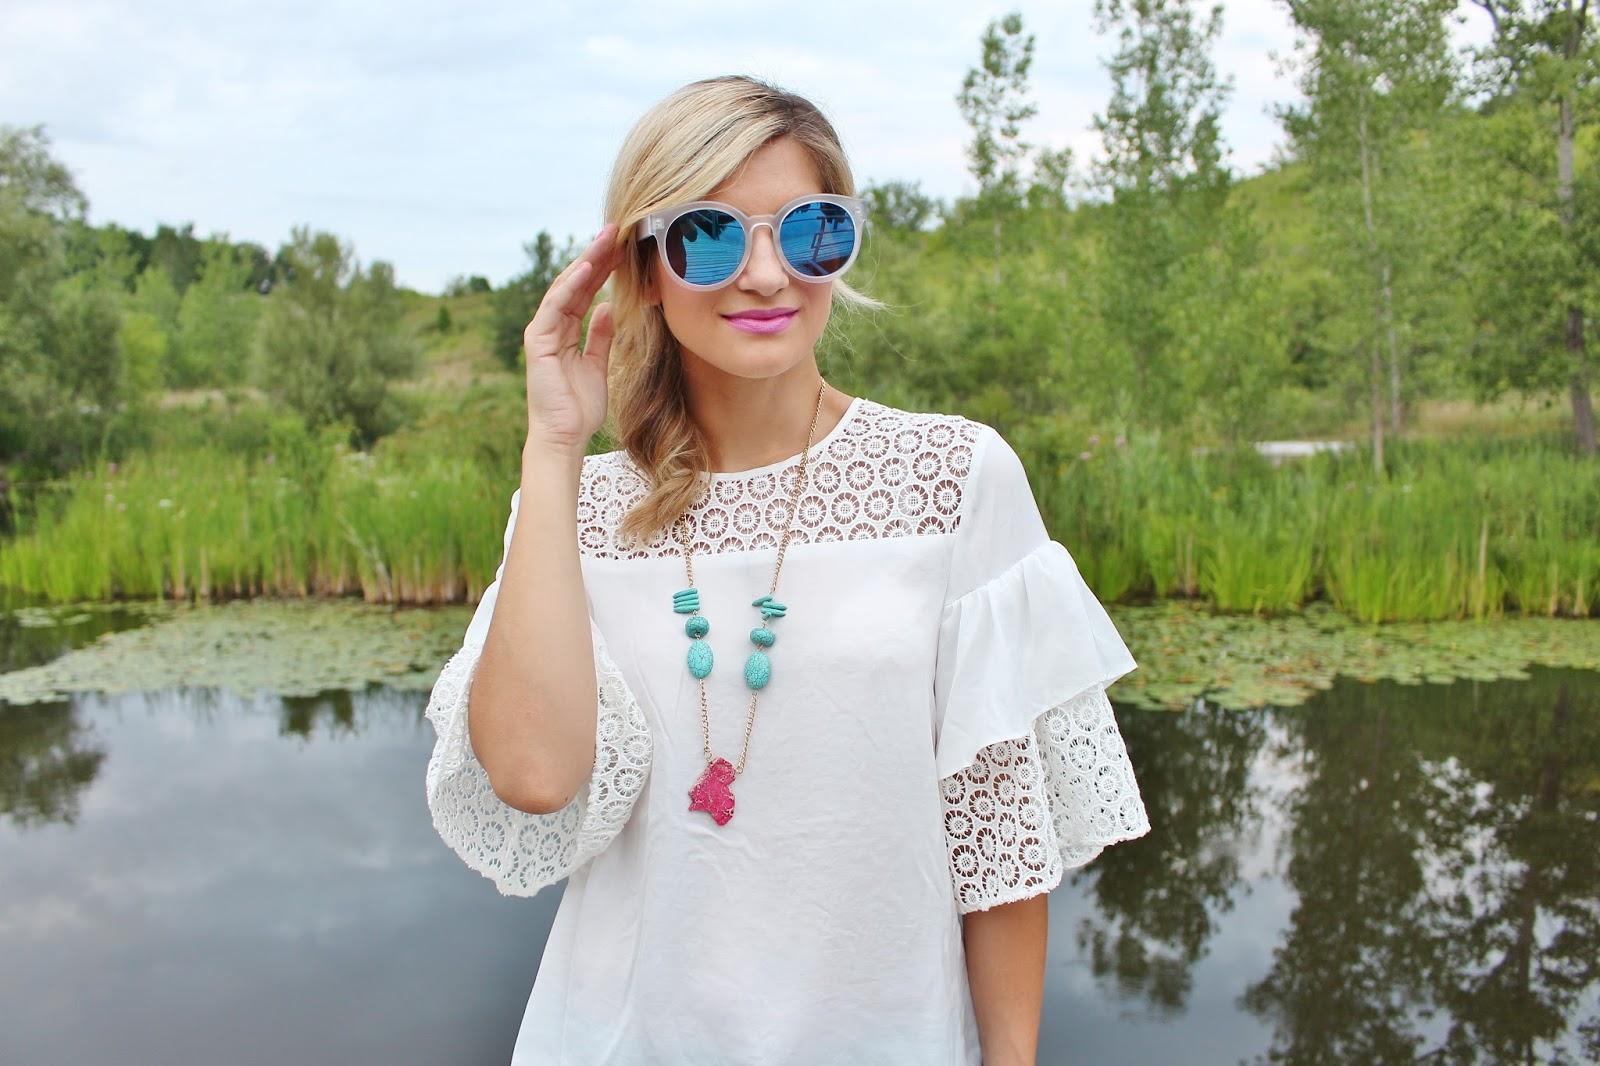 bijuleni-mirrored blue sunglasses